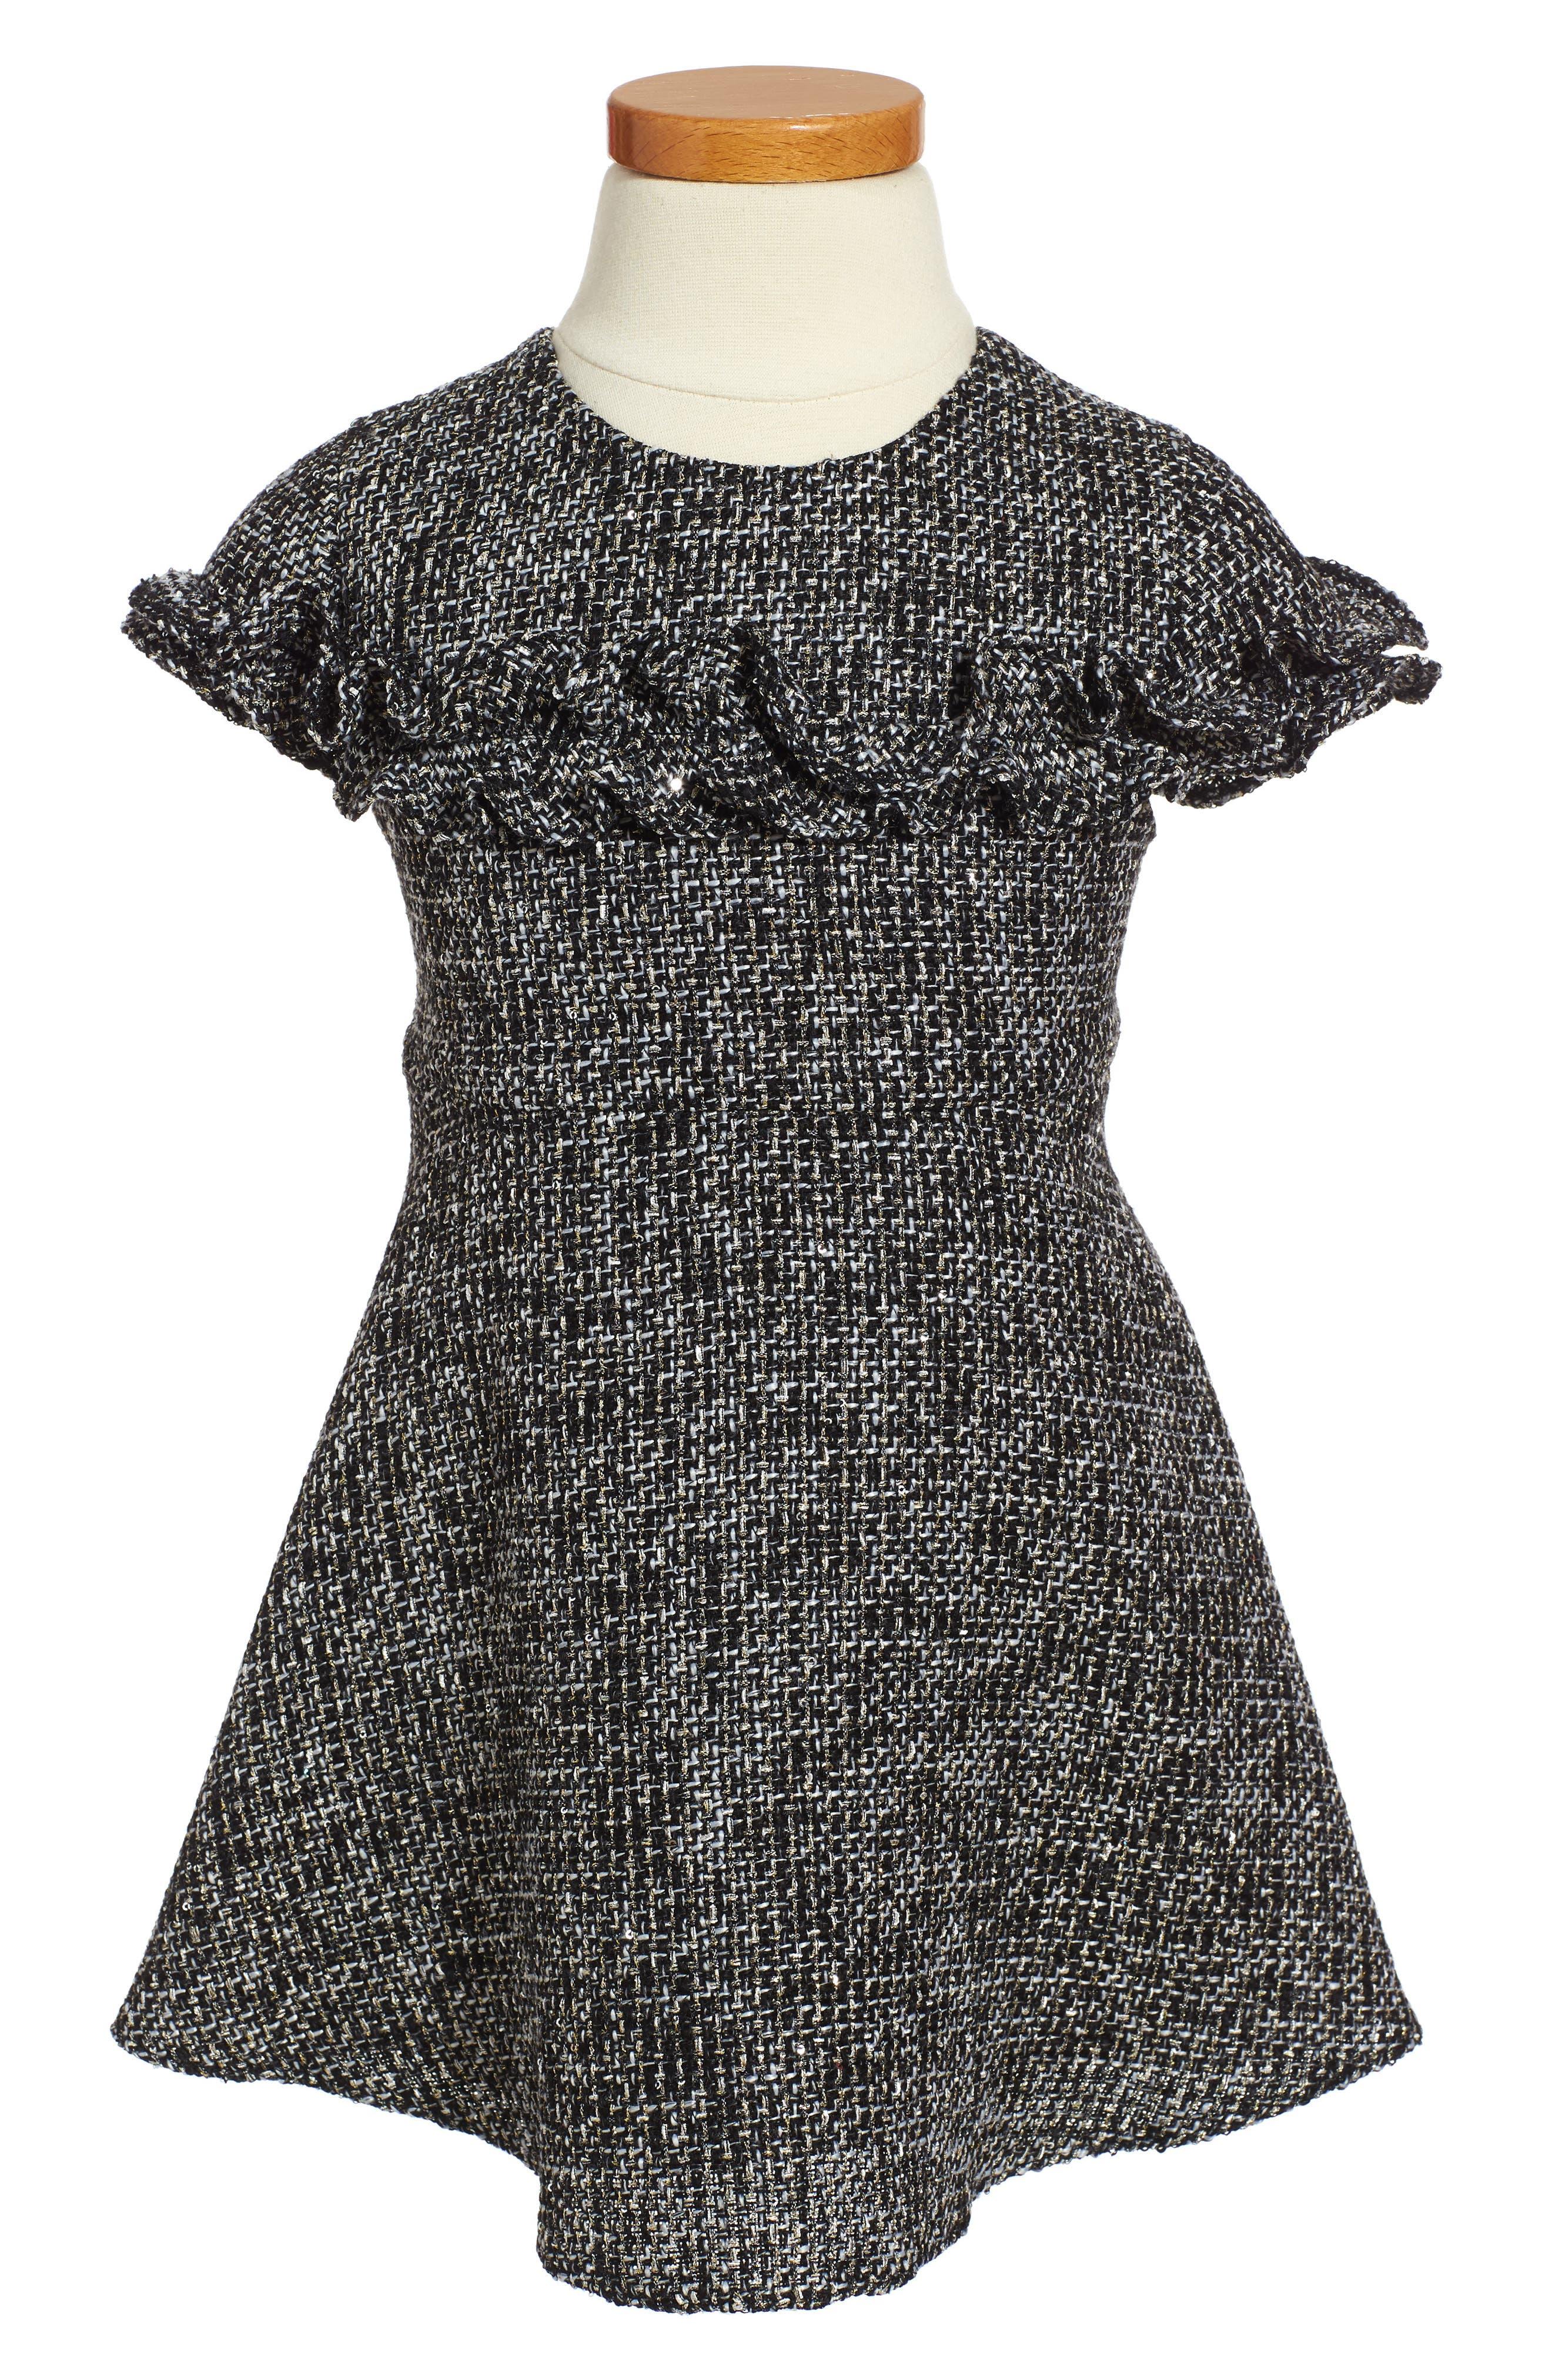 Sequin Tweed Dress,                         Main,                         color, Black